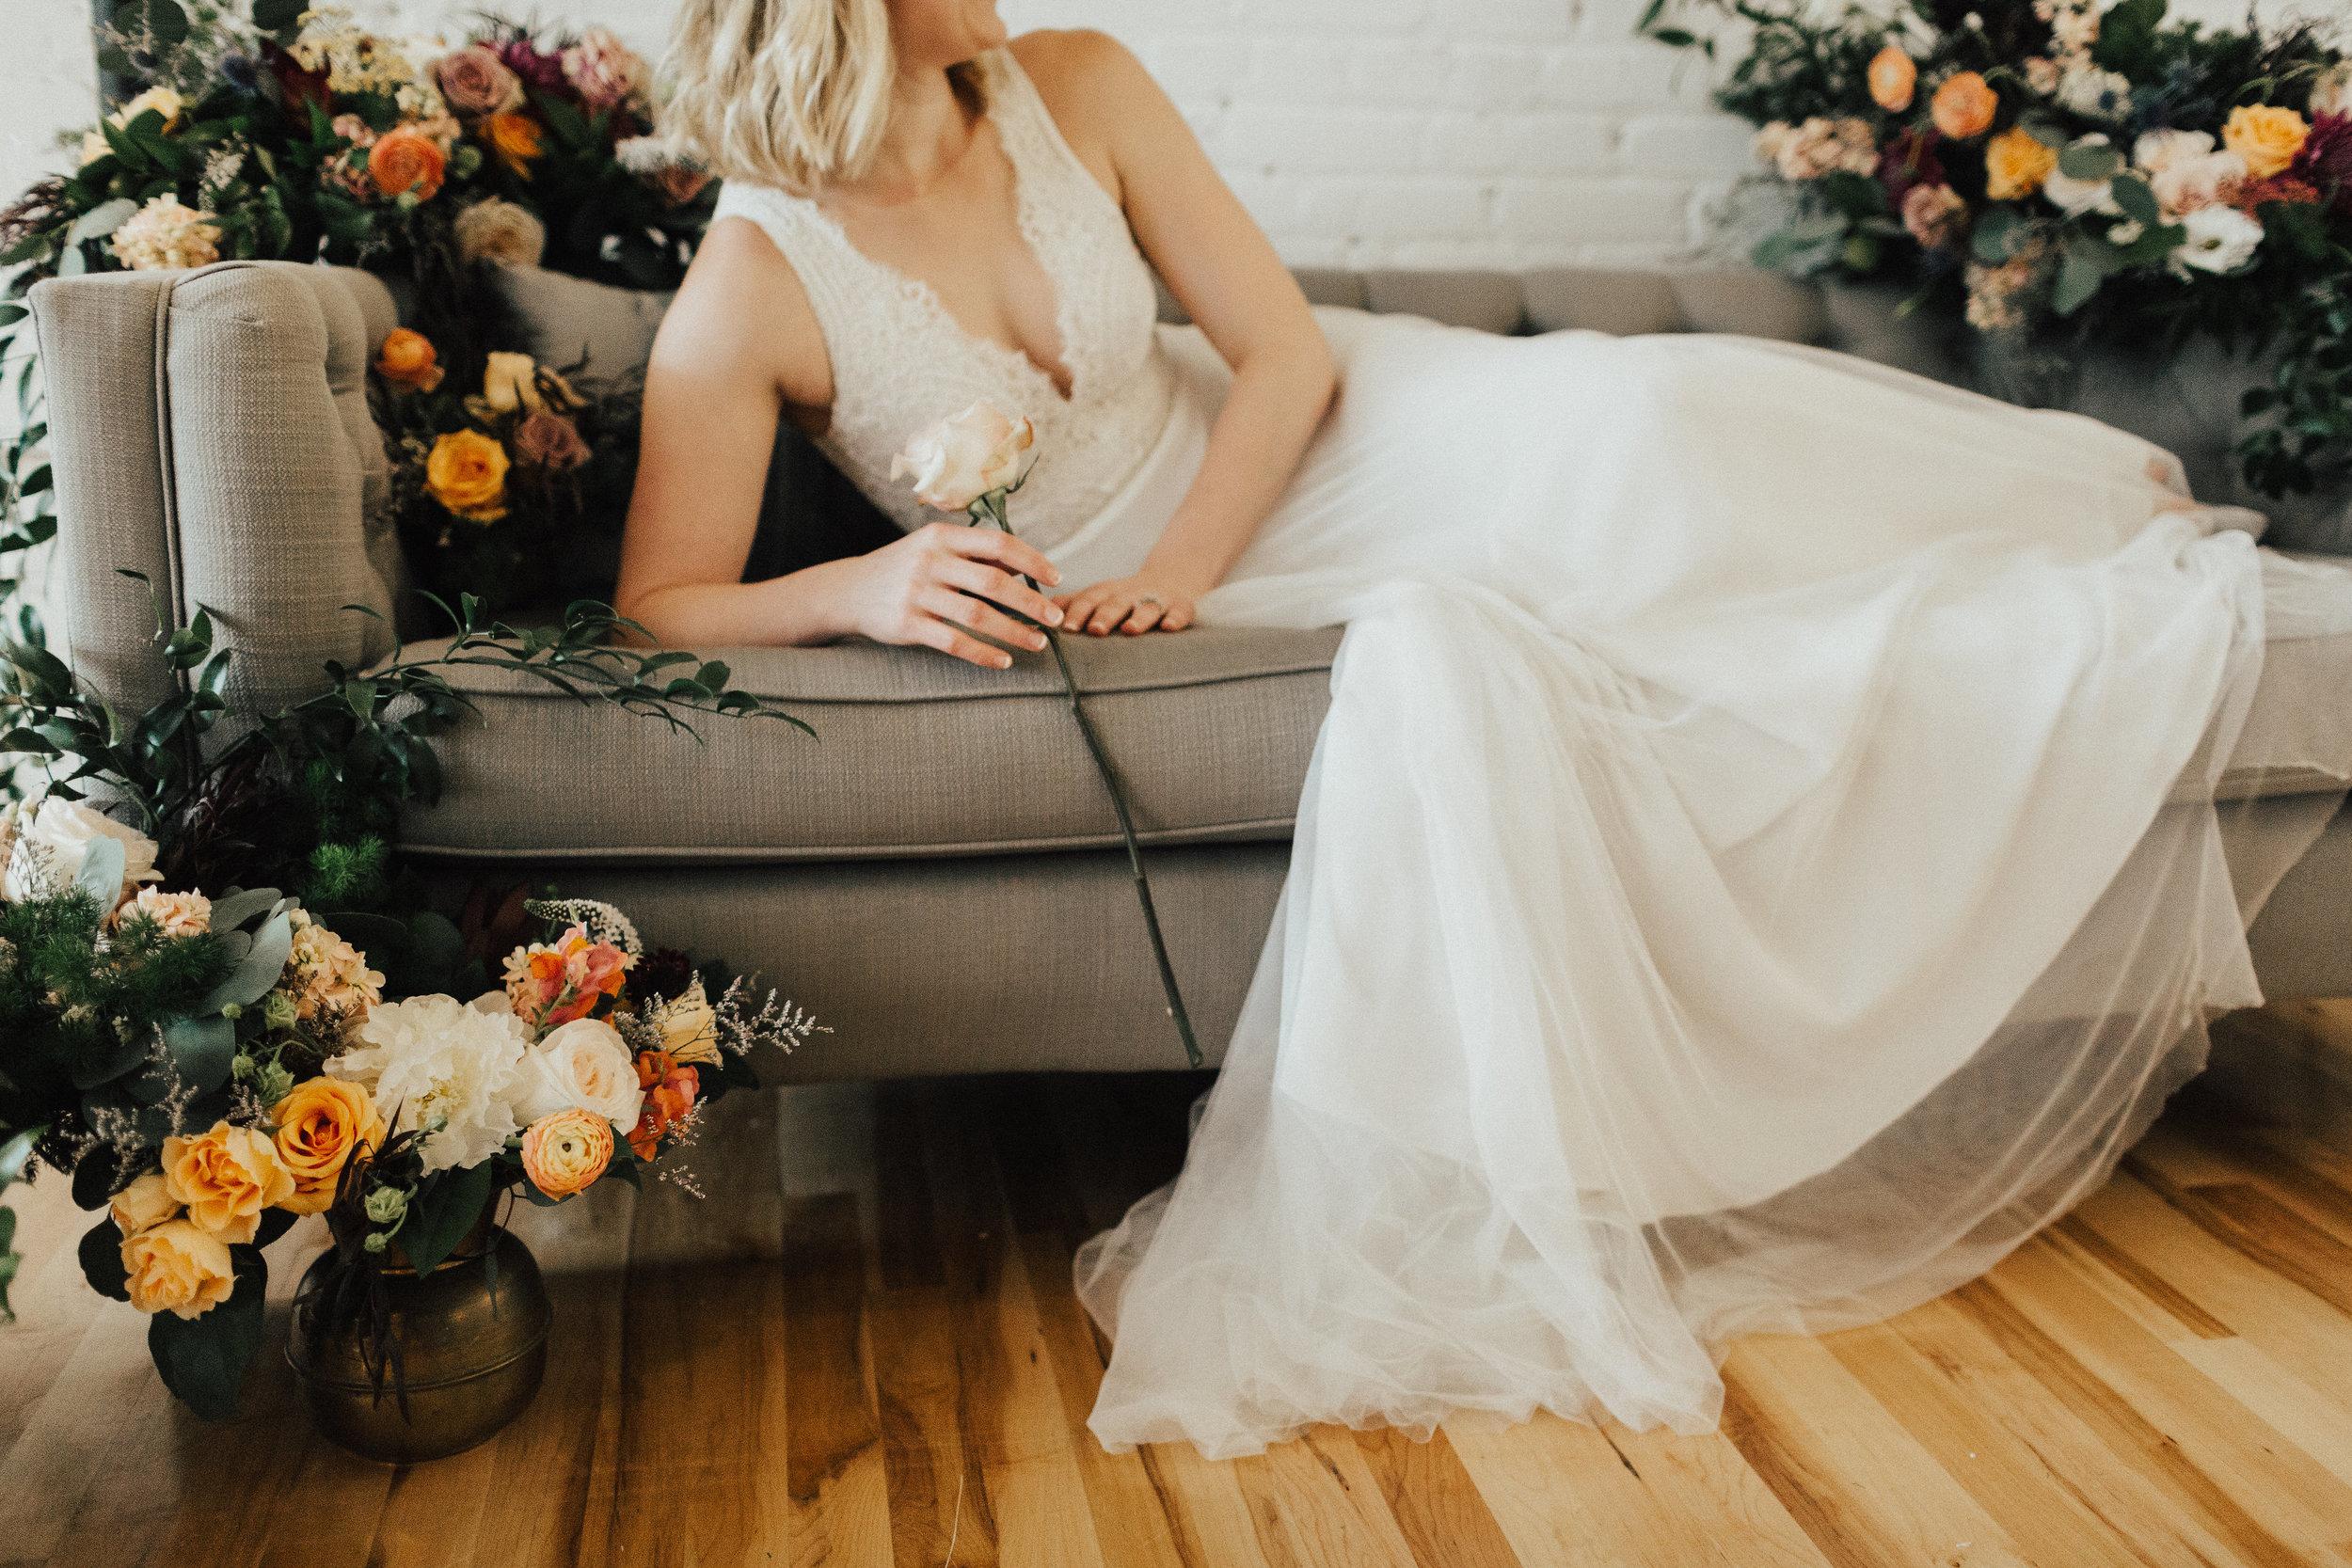 heart and soul wedding florist beautiful romantic kc florist 14